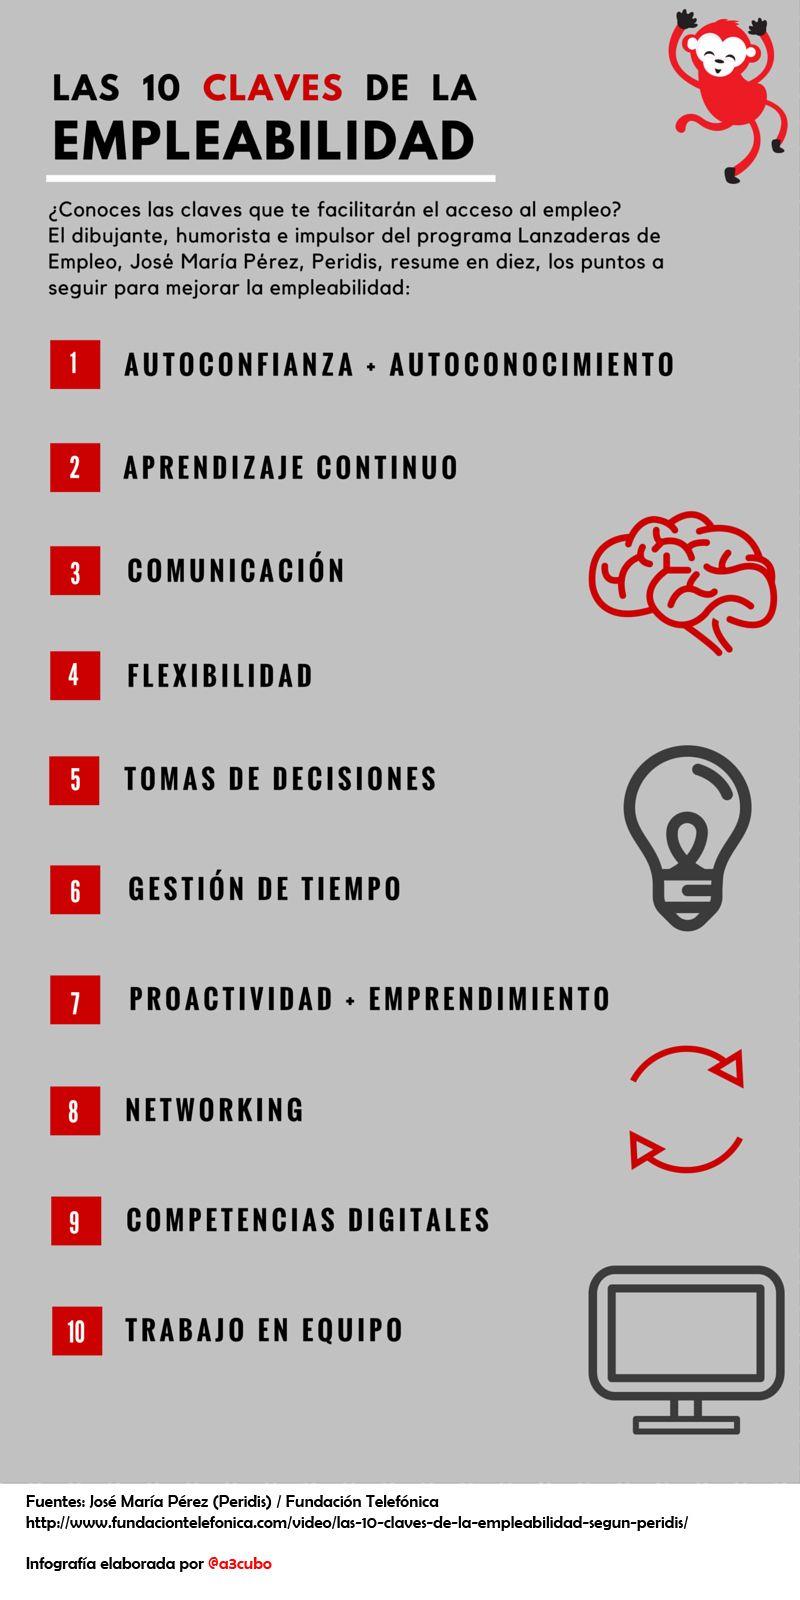 Las 10 claves de la Empleabilidad #infografia #infographic #empleo ...